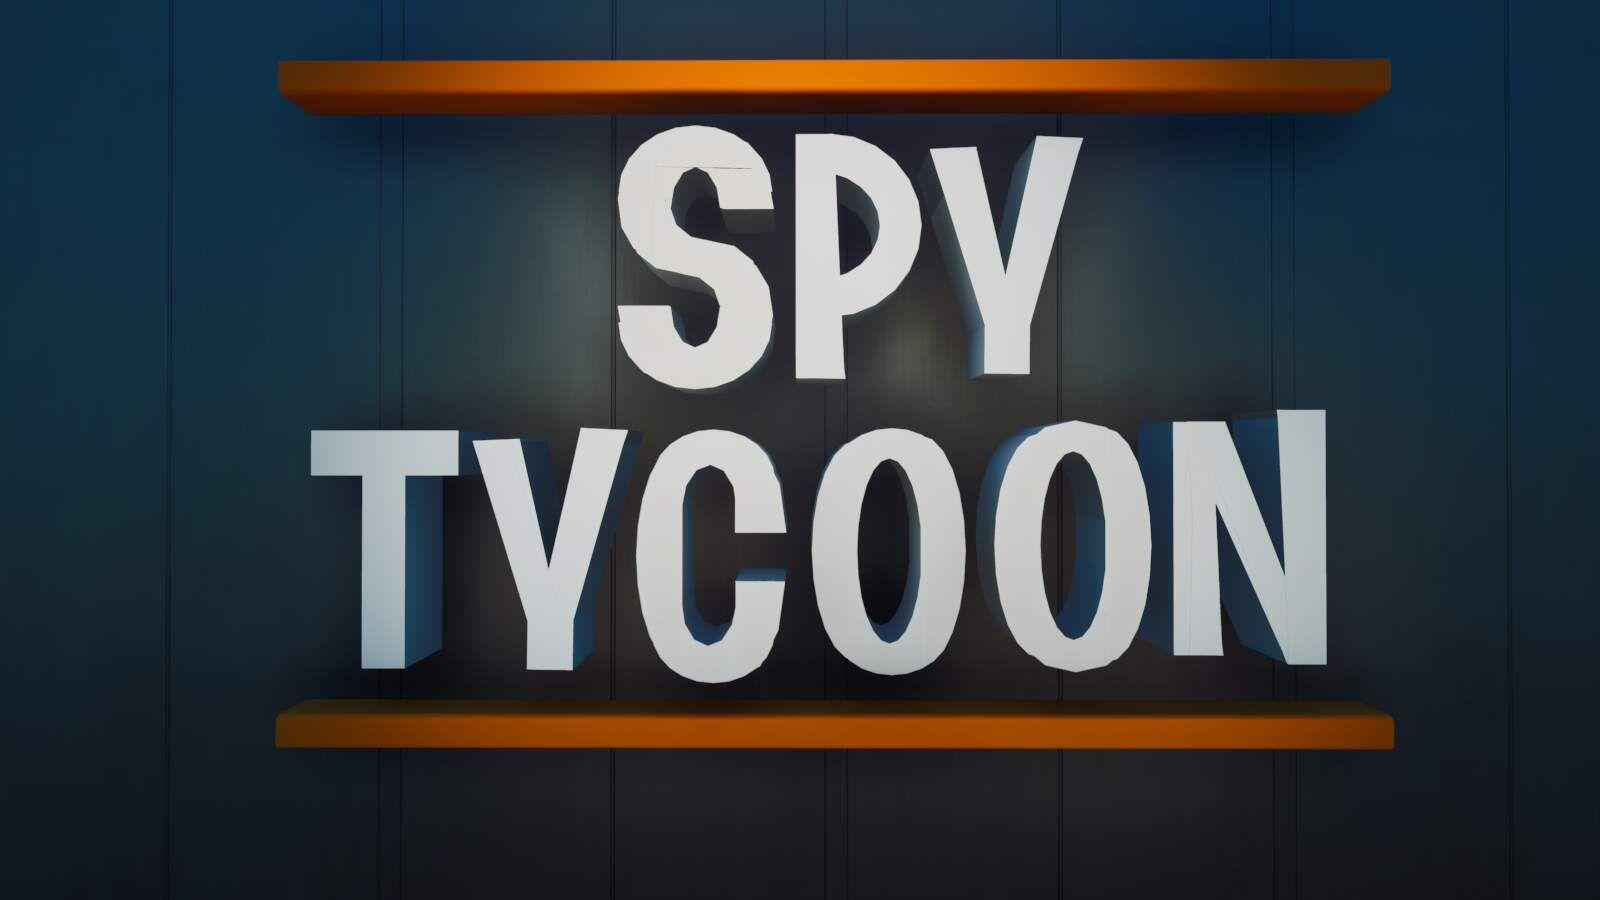 Spy Tycoon 5990-3025-0295 by brendannnd